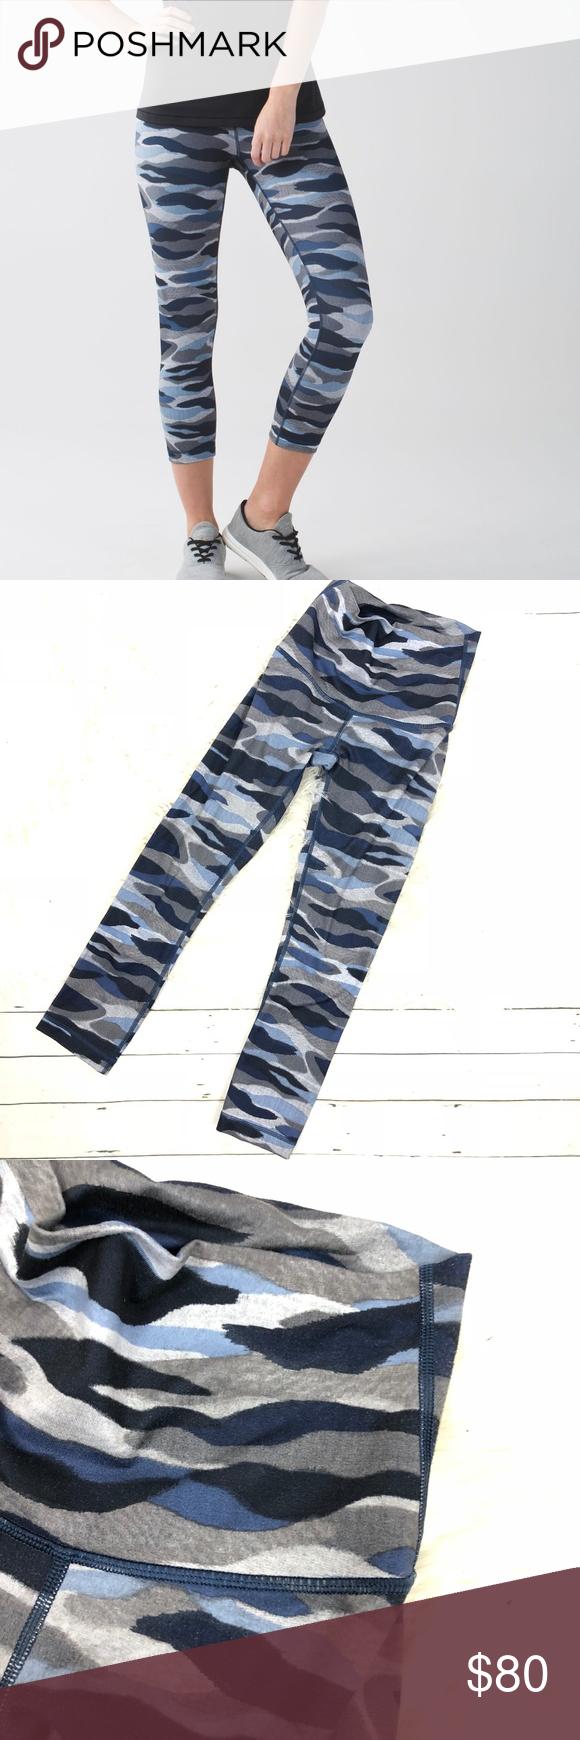 d7643c82d8418a Lululemon hi-rise wunder under blue navy camo crop Rare! Lululemon Women's  wunder-under hi-rise camo cropped leggings in Mini Coast Camo Deep Navy  Multi ...